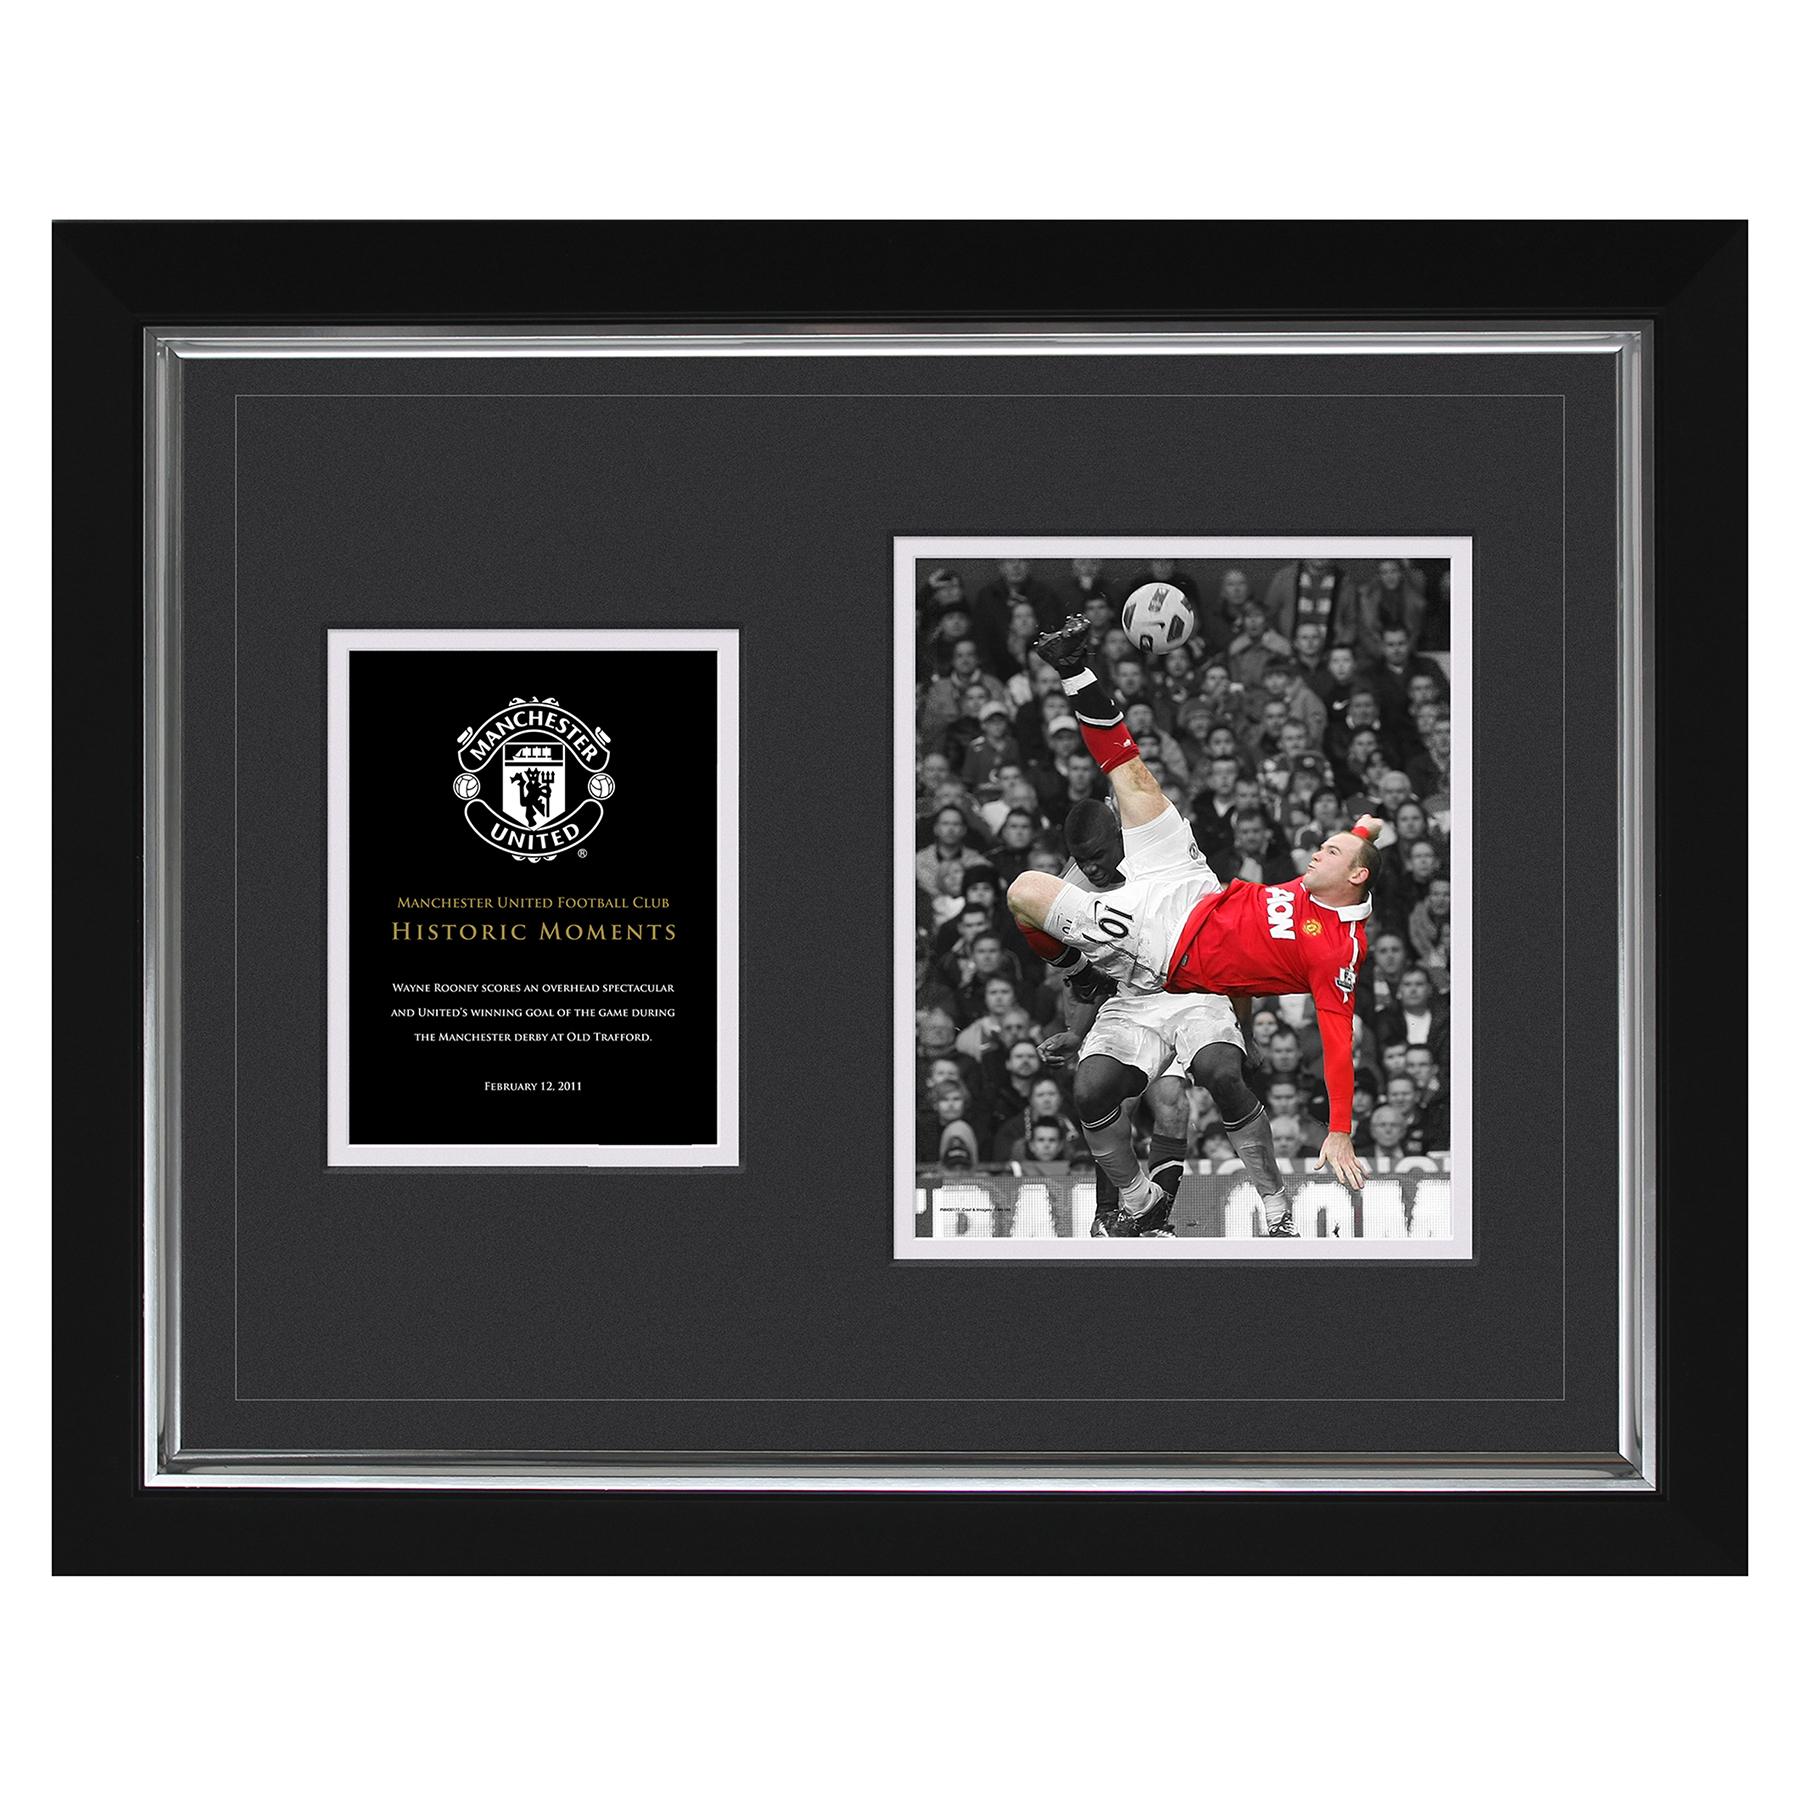 Manchester United Historic Moments - Rooney Overhead Kick Framed Print